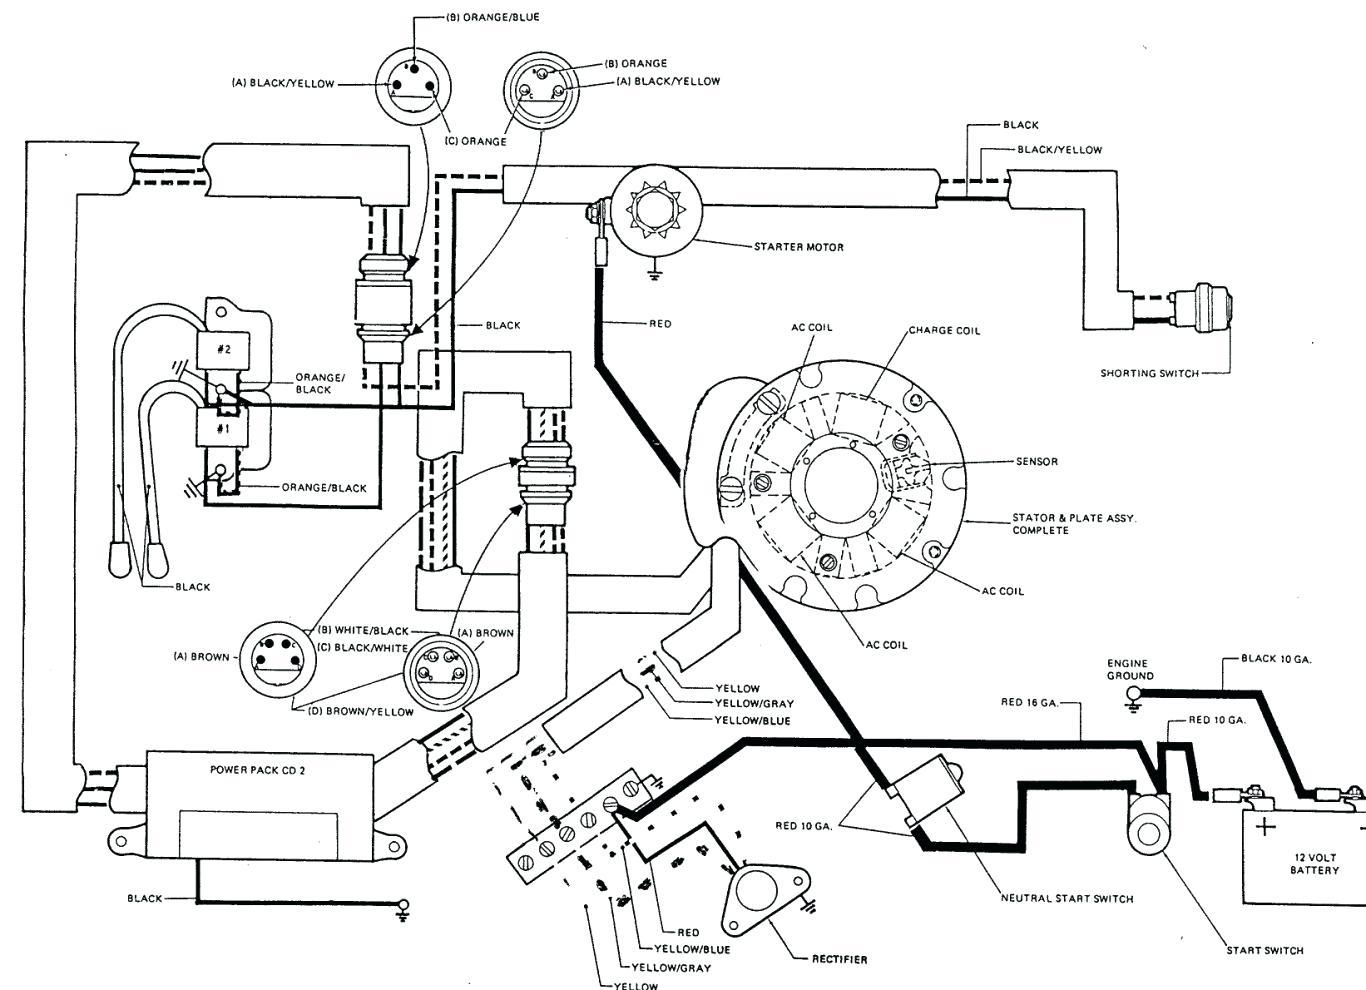 Pleasing Yamaha G19 Golf Cart Wiring Diagram Auto Electrical Wiring Diagram Wiring Cloud Mousmenurrecoveryedborg